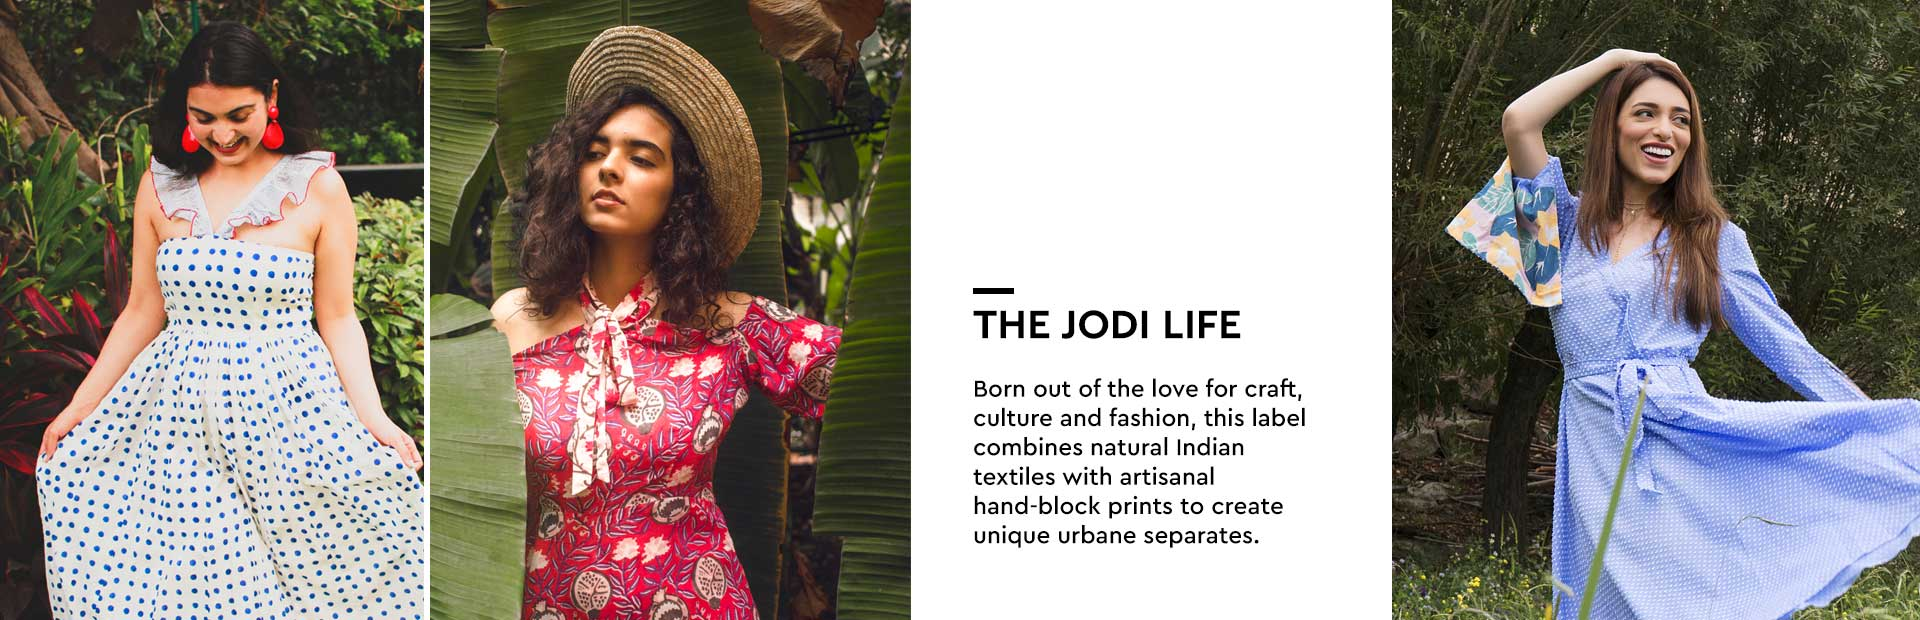 1baf69c8c29faa The Jodi Life-Shop For The Jodi Life Designer Wear Online